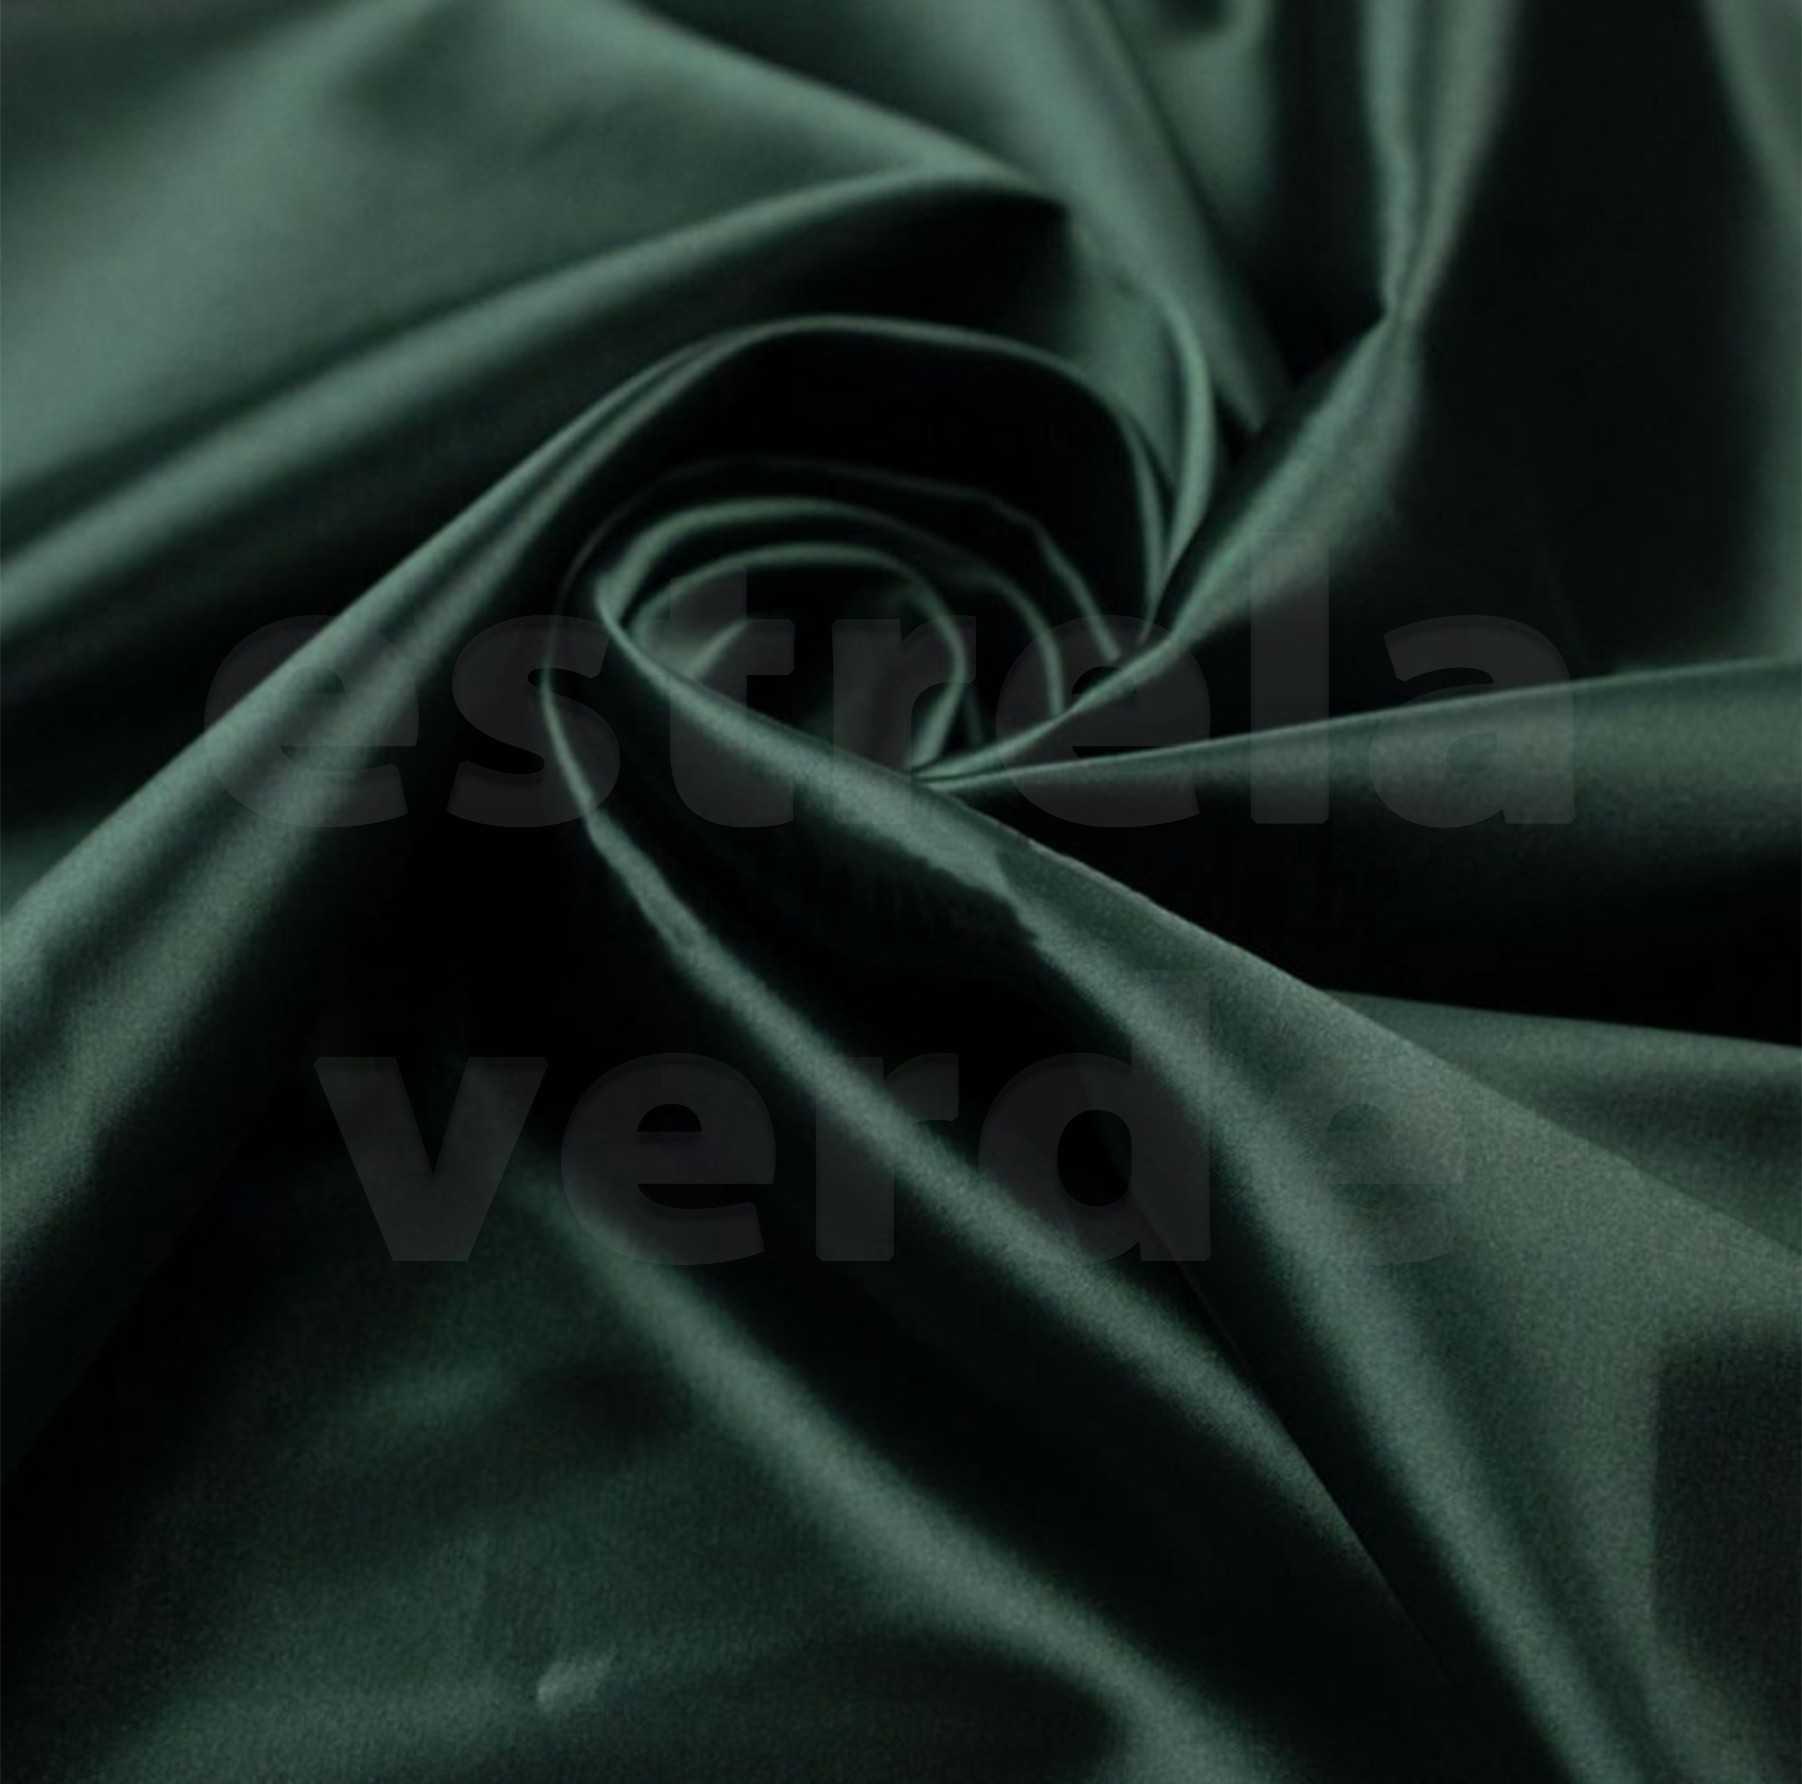 CETIM LISO 671 VERDE MUSGO 1,50 LARG  - Estrela Verde